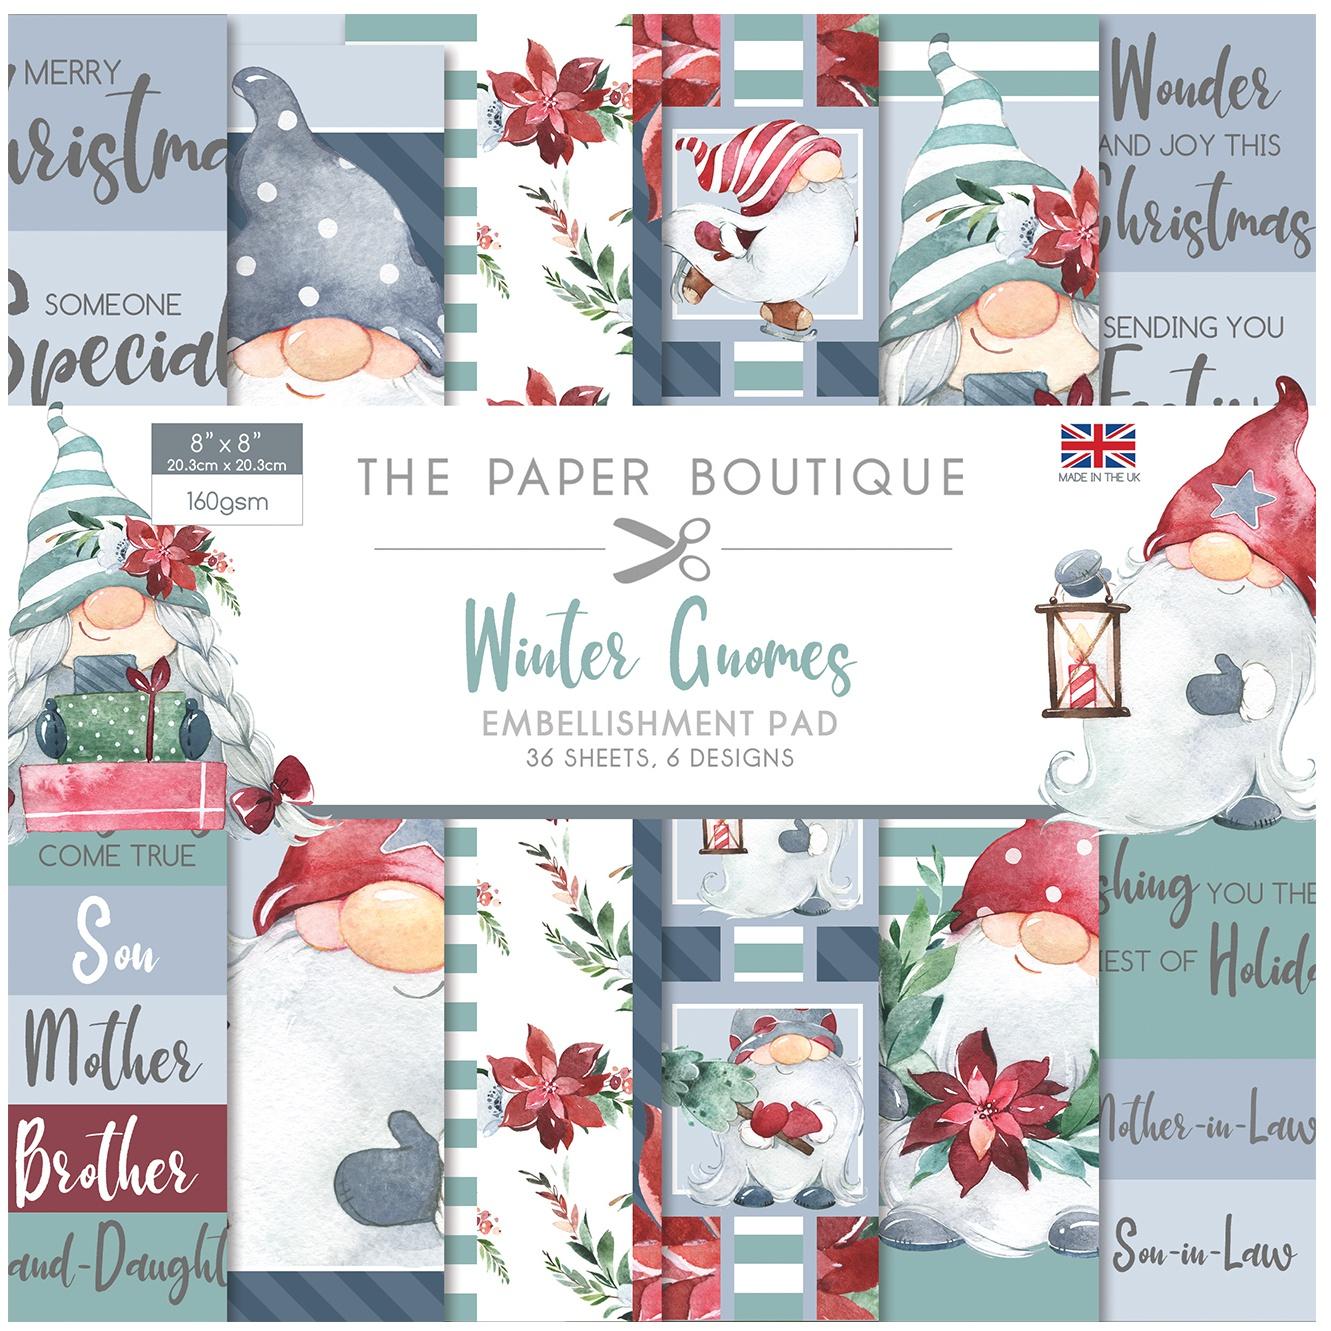 THE PAPER BOUTIQUE 8X8 PAD: WINTER GNOMES